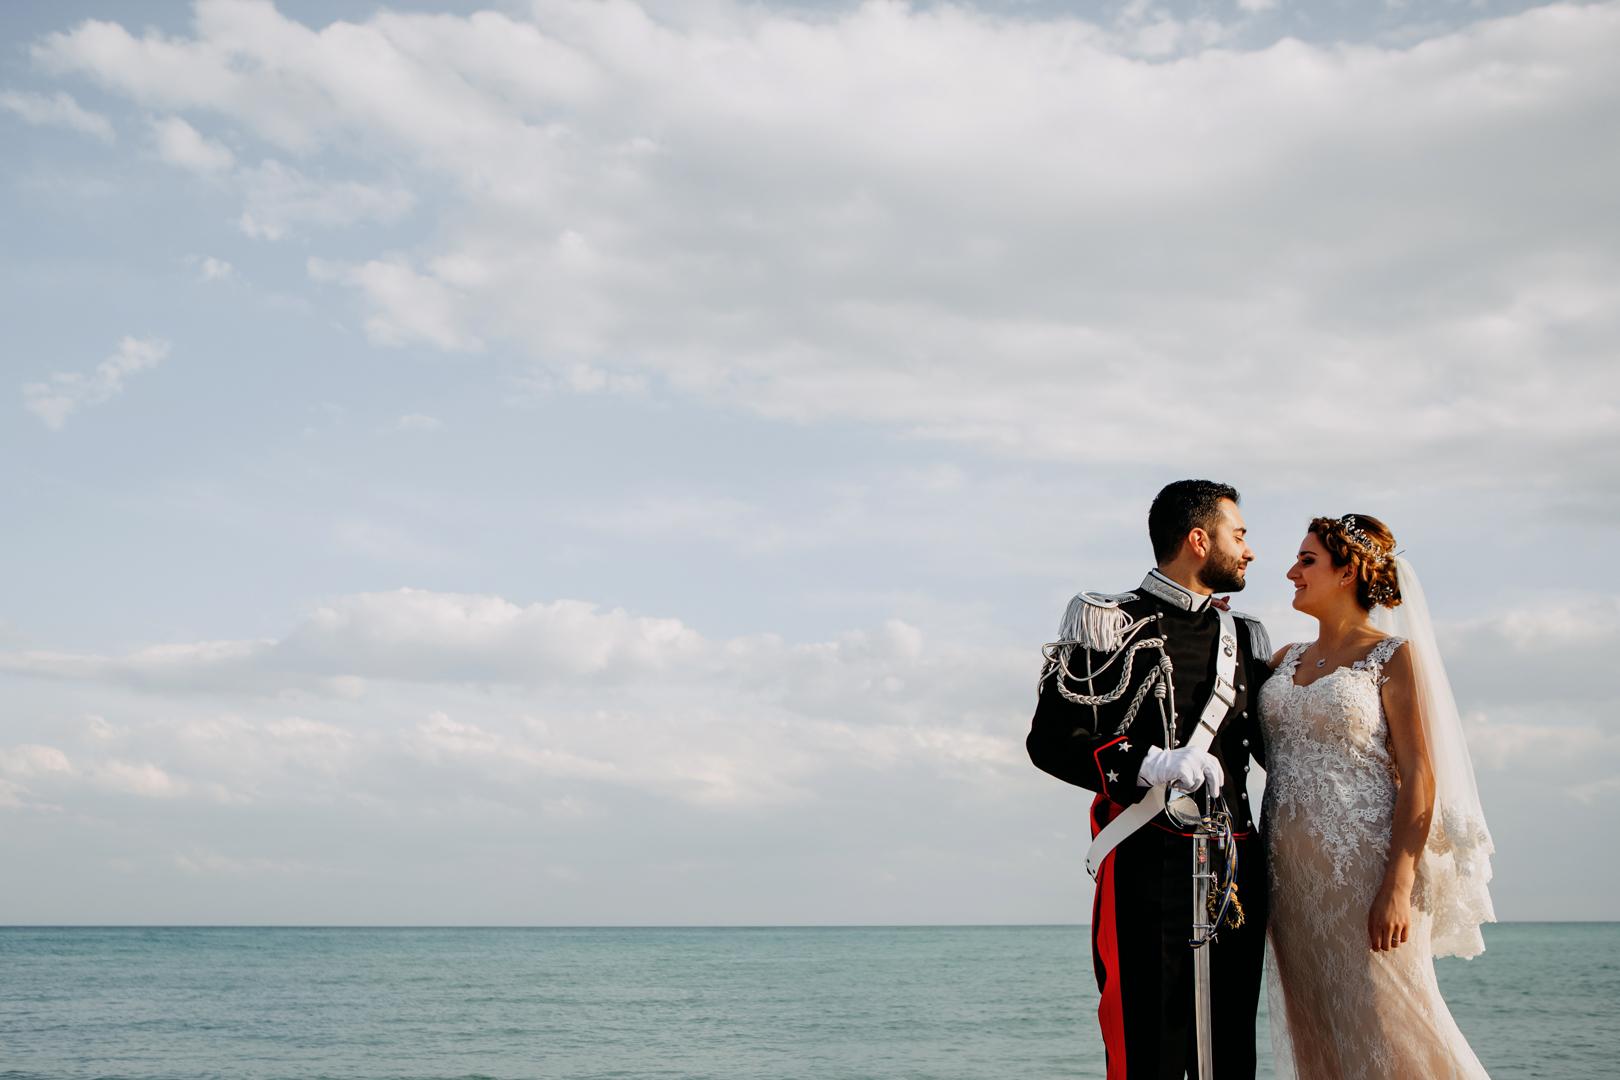 38 matrimonio-sposi-mare-sea-fotografo-gianni-lepore